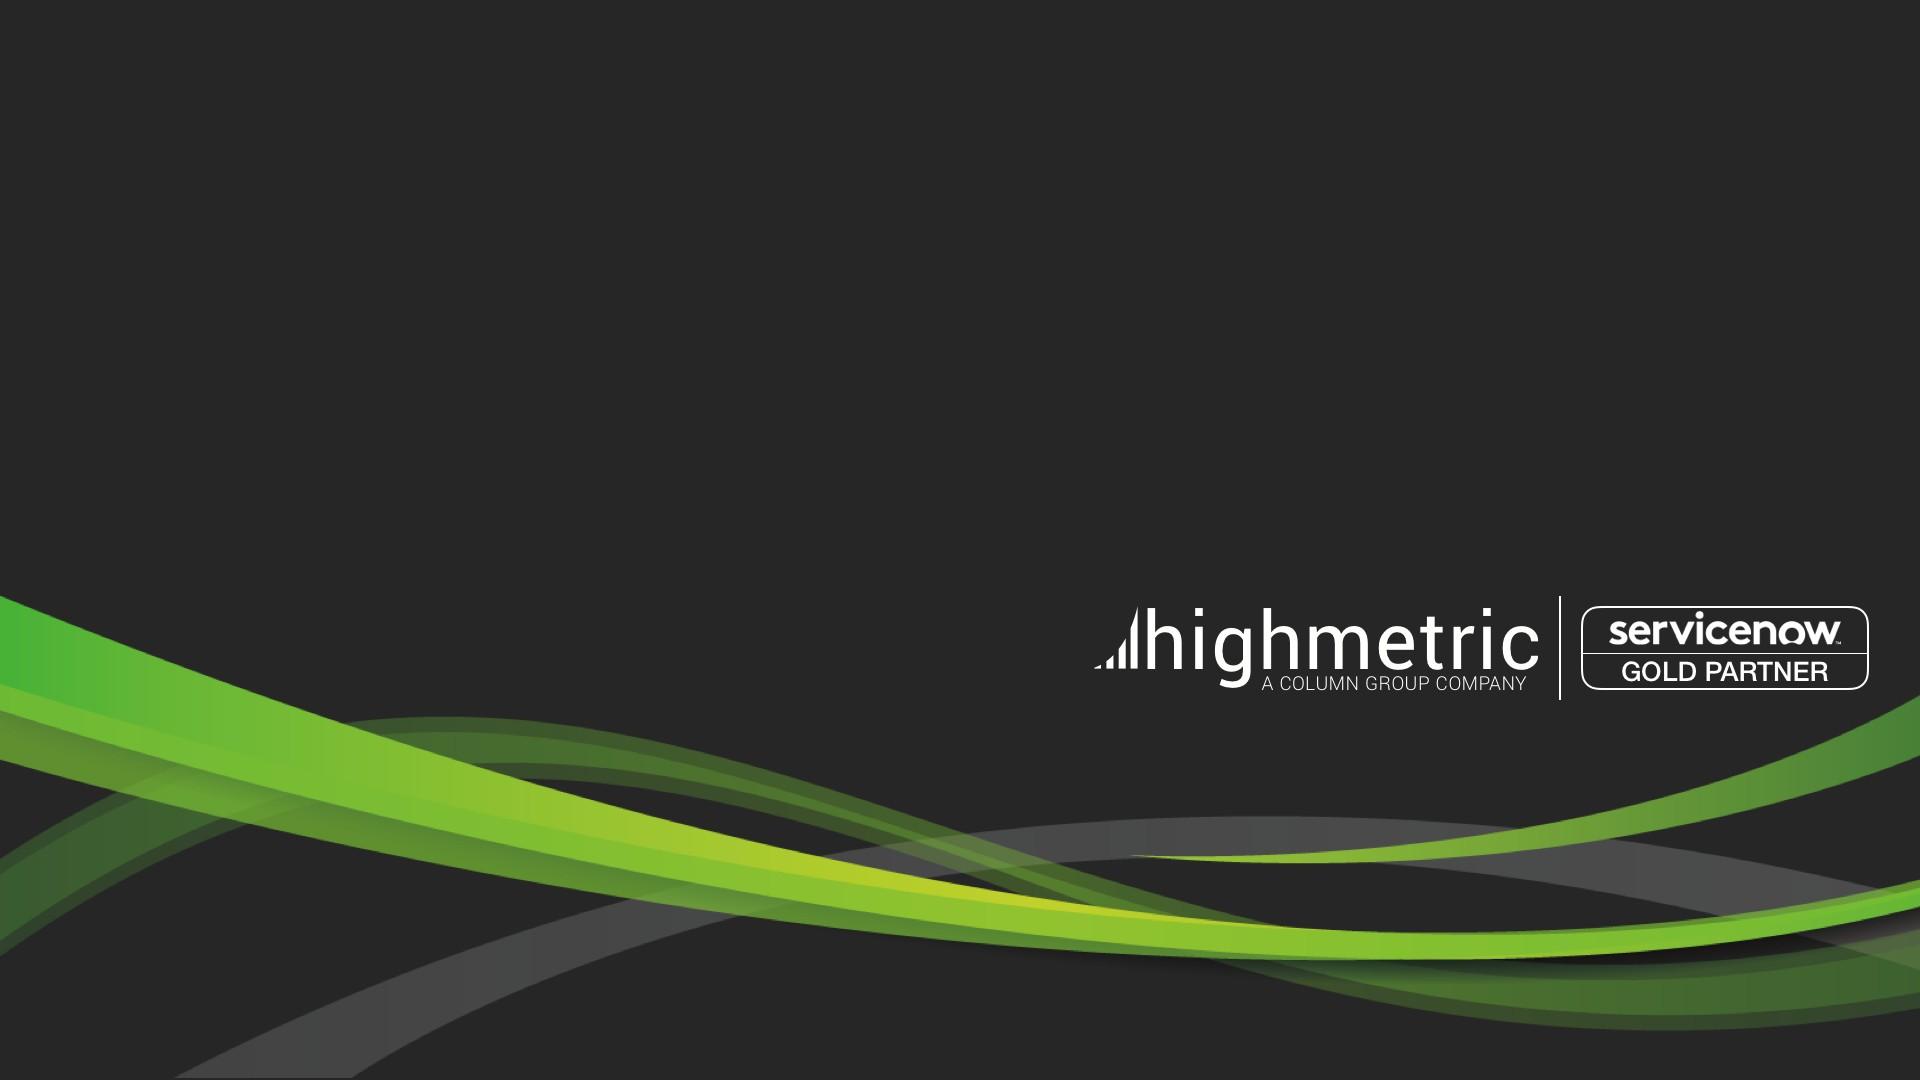 Highmetric | Global ServiceNow Partner | LinkedIn